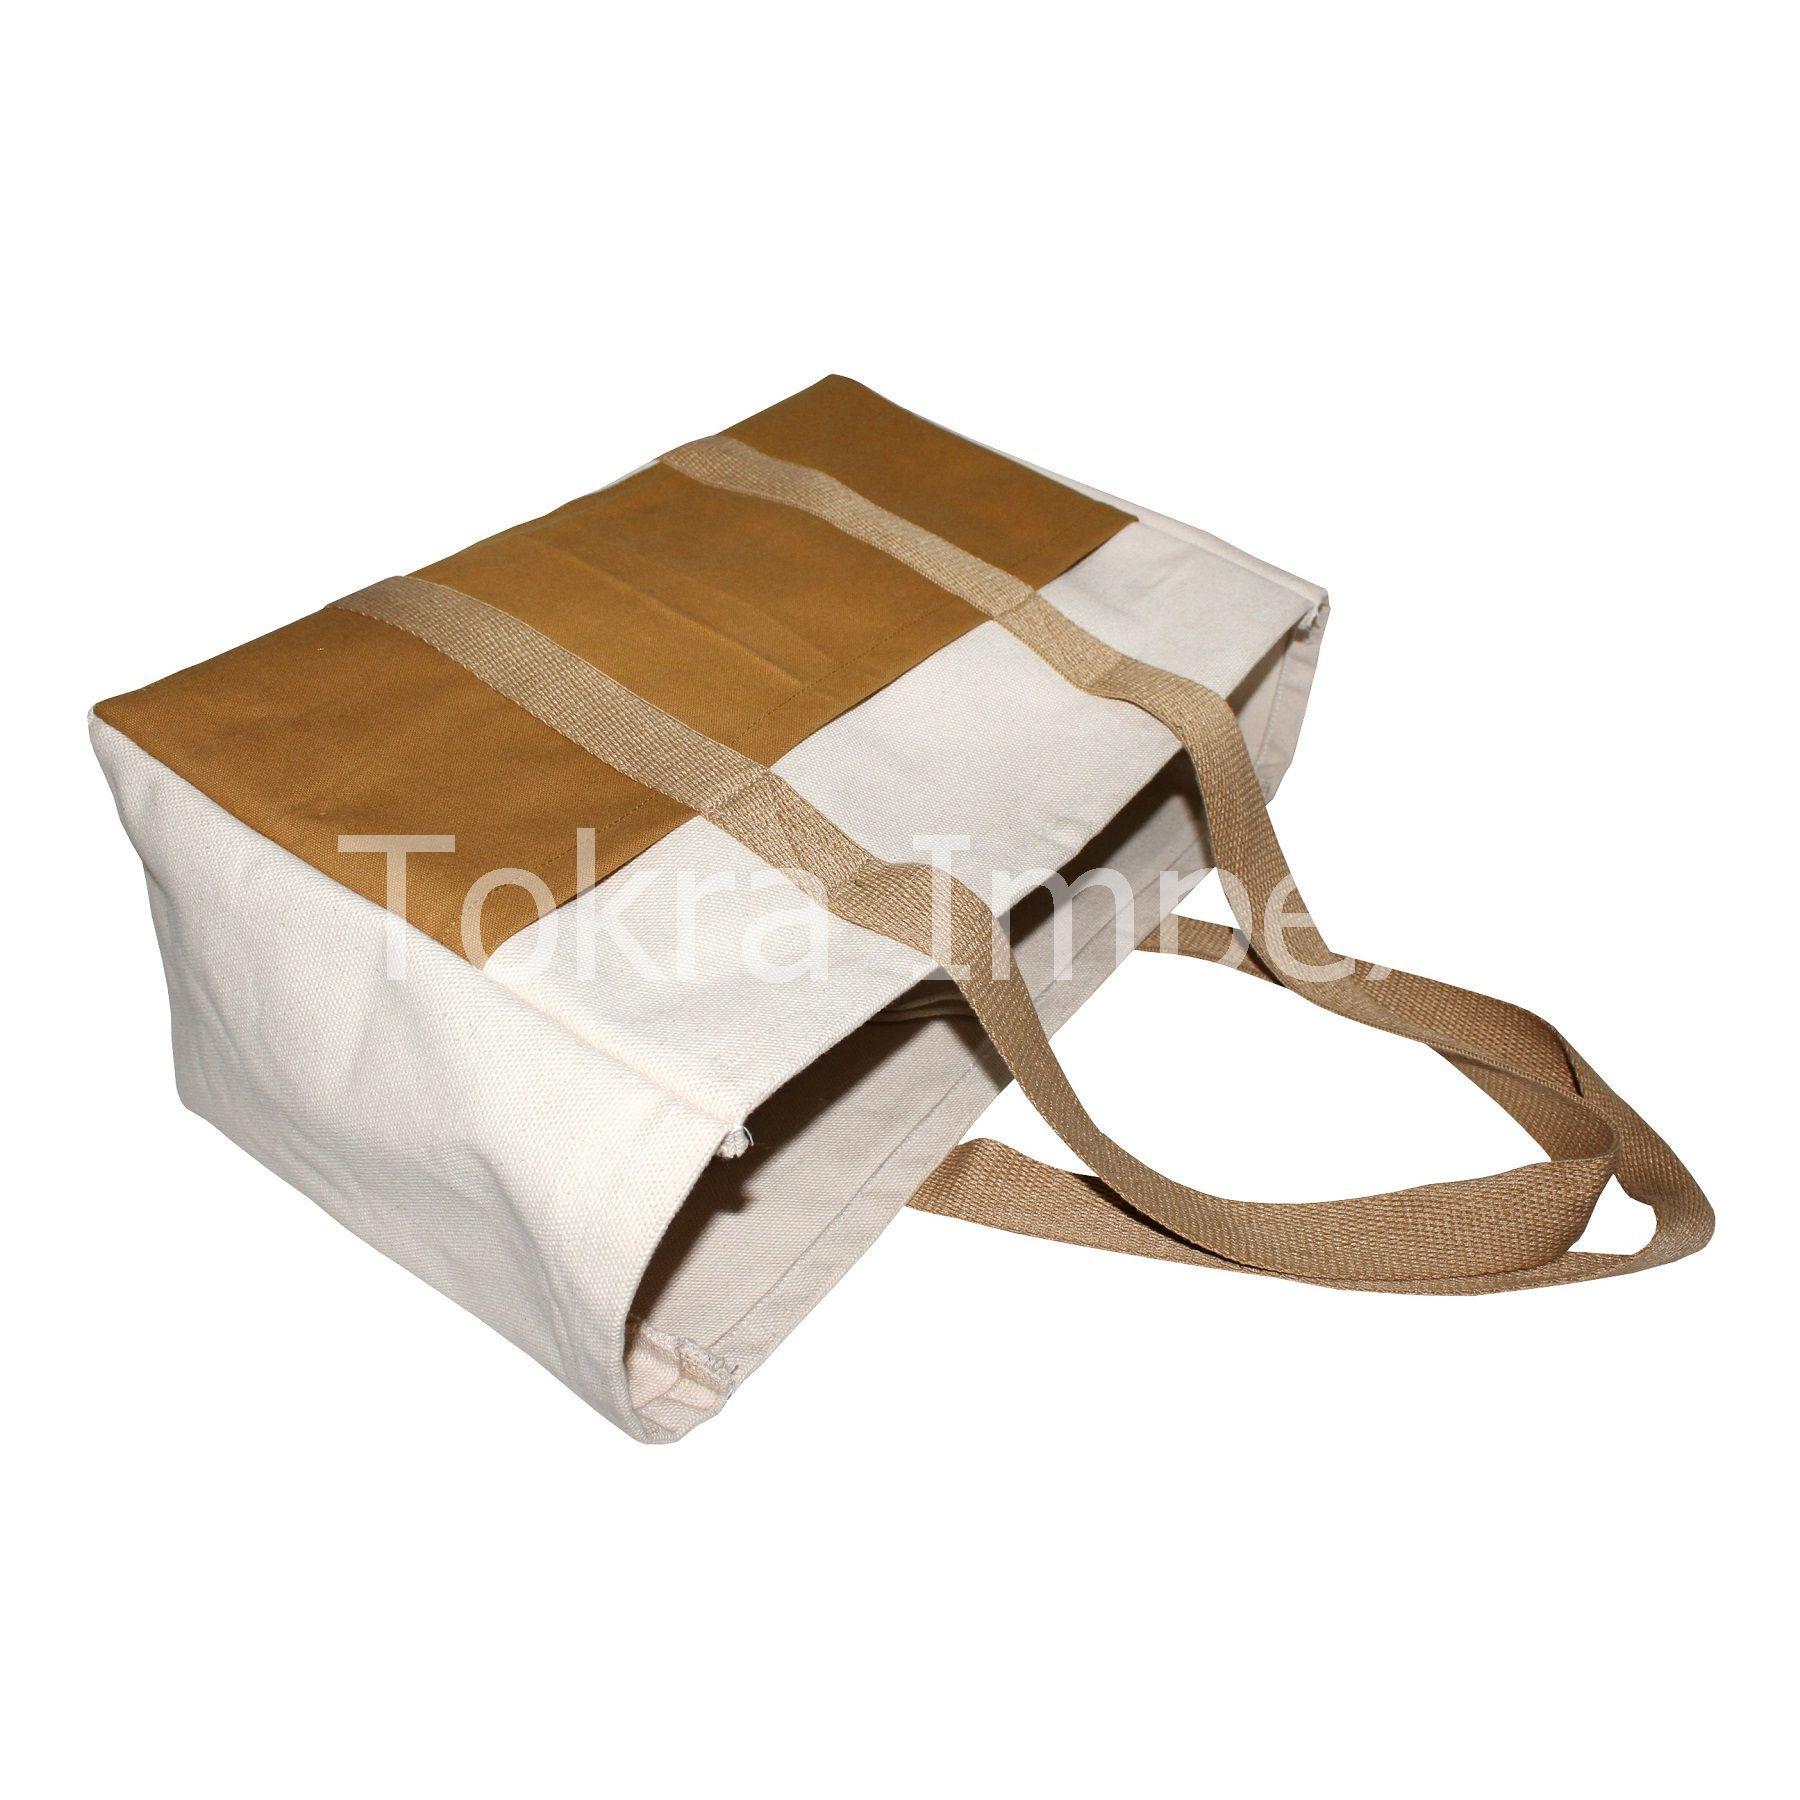 Heavy Duty Canvas Shopping Bags